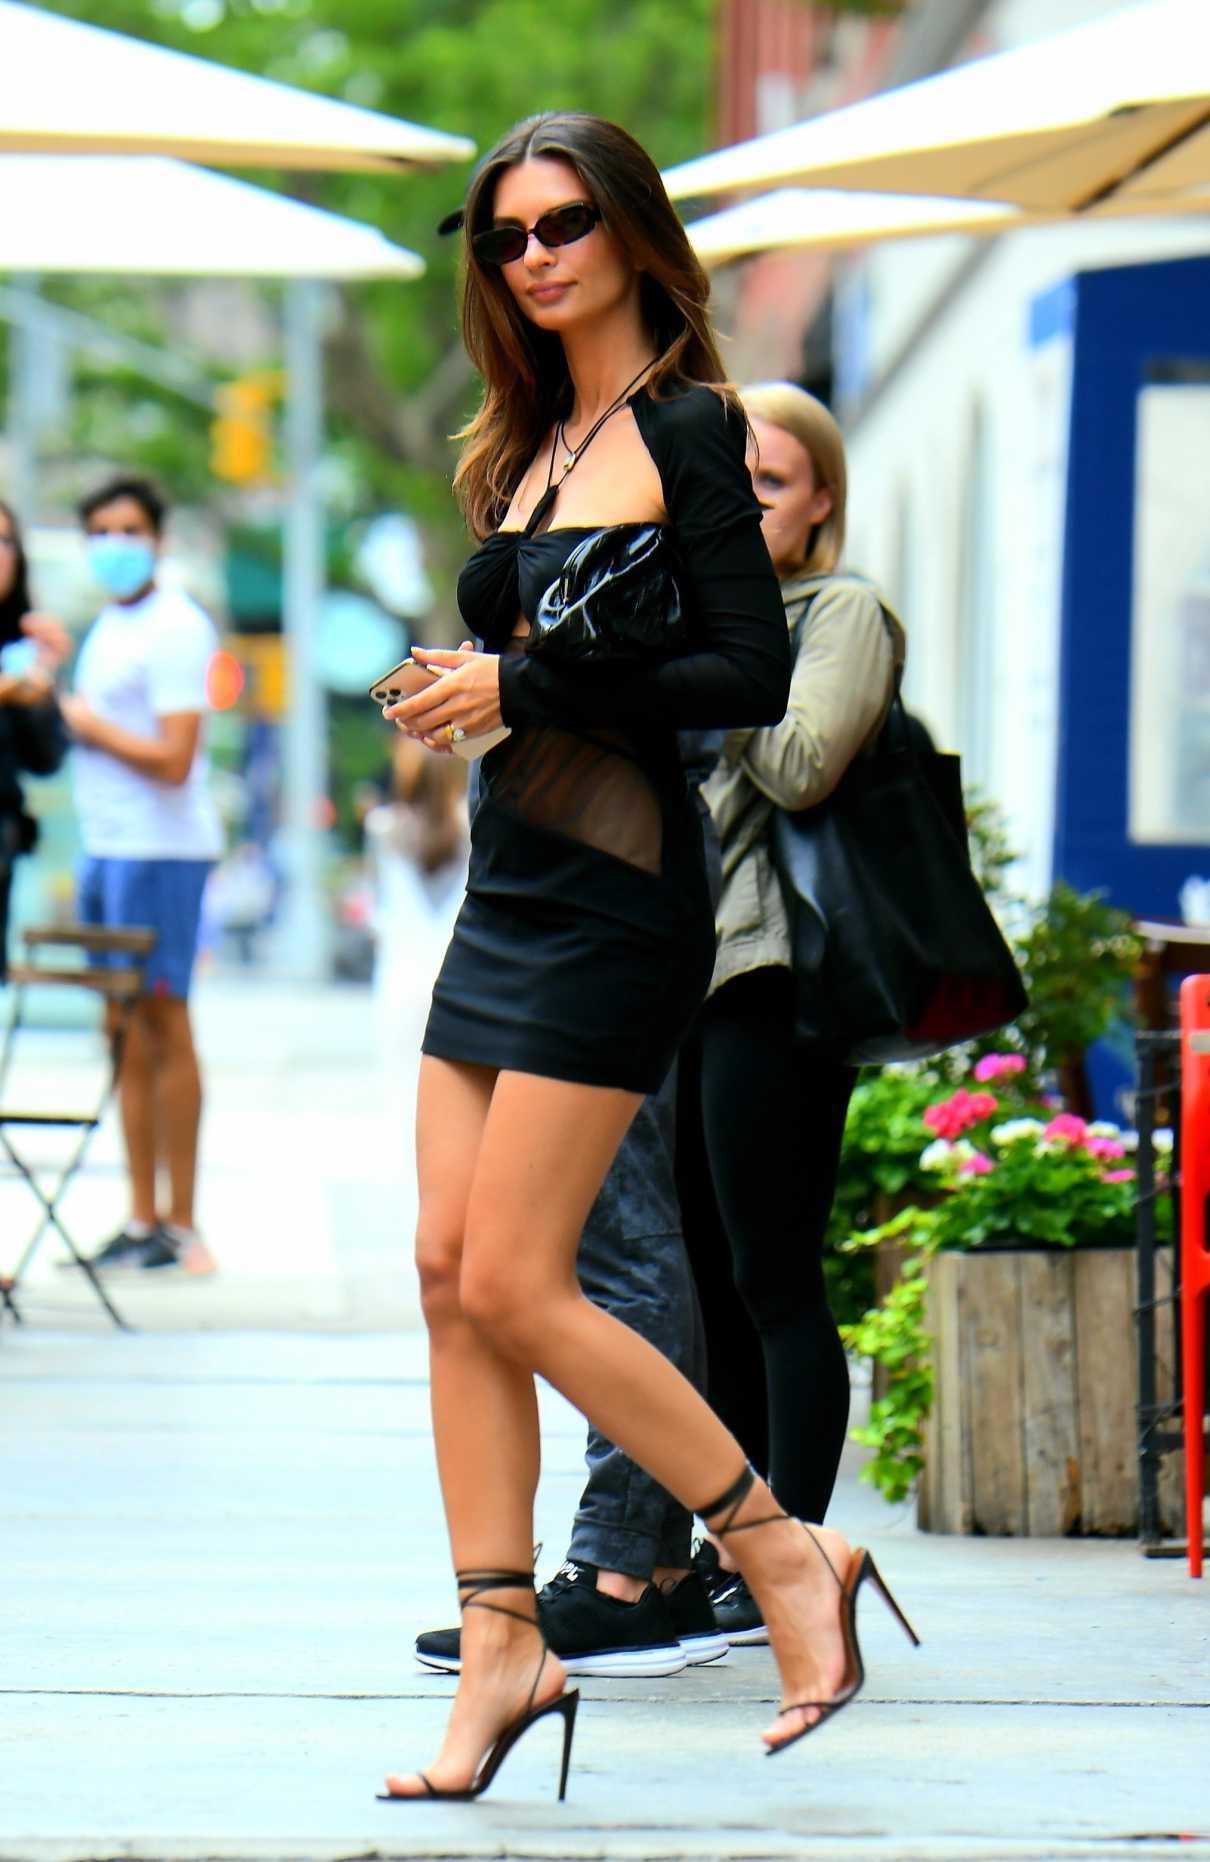 Emily Ratajkowski in a Black Mini Dress